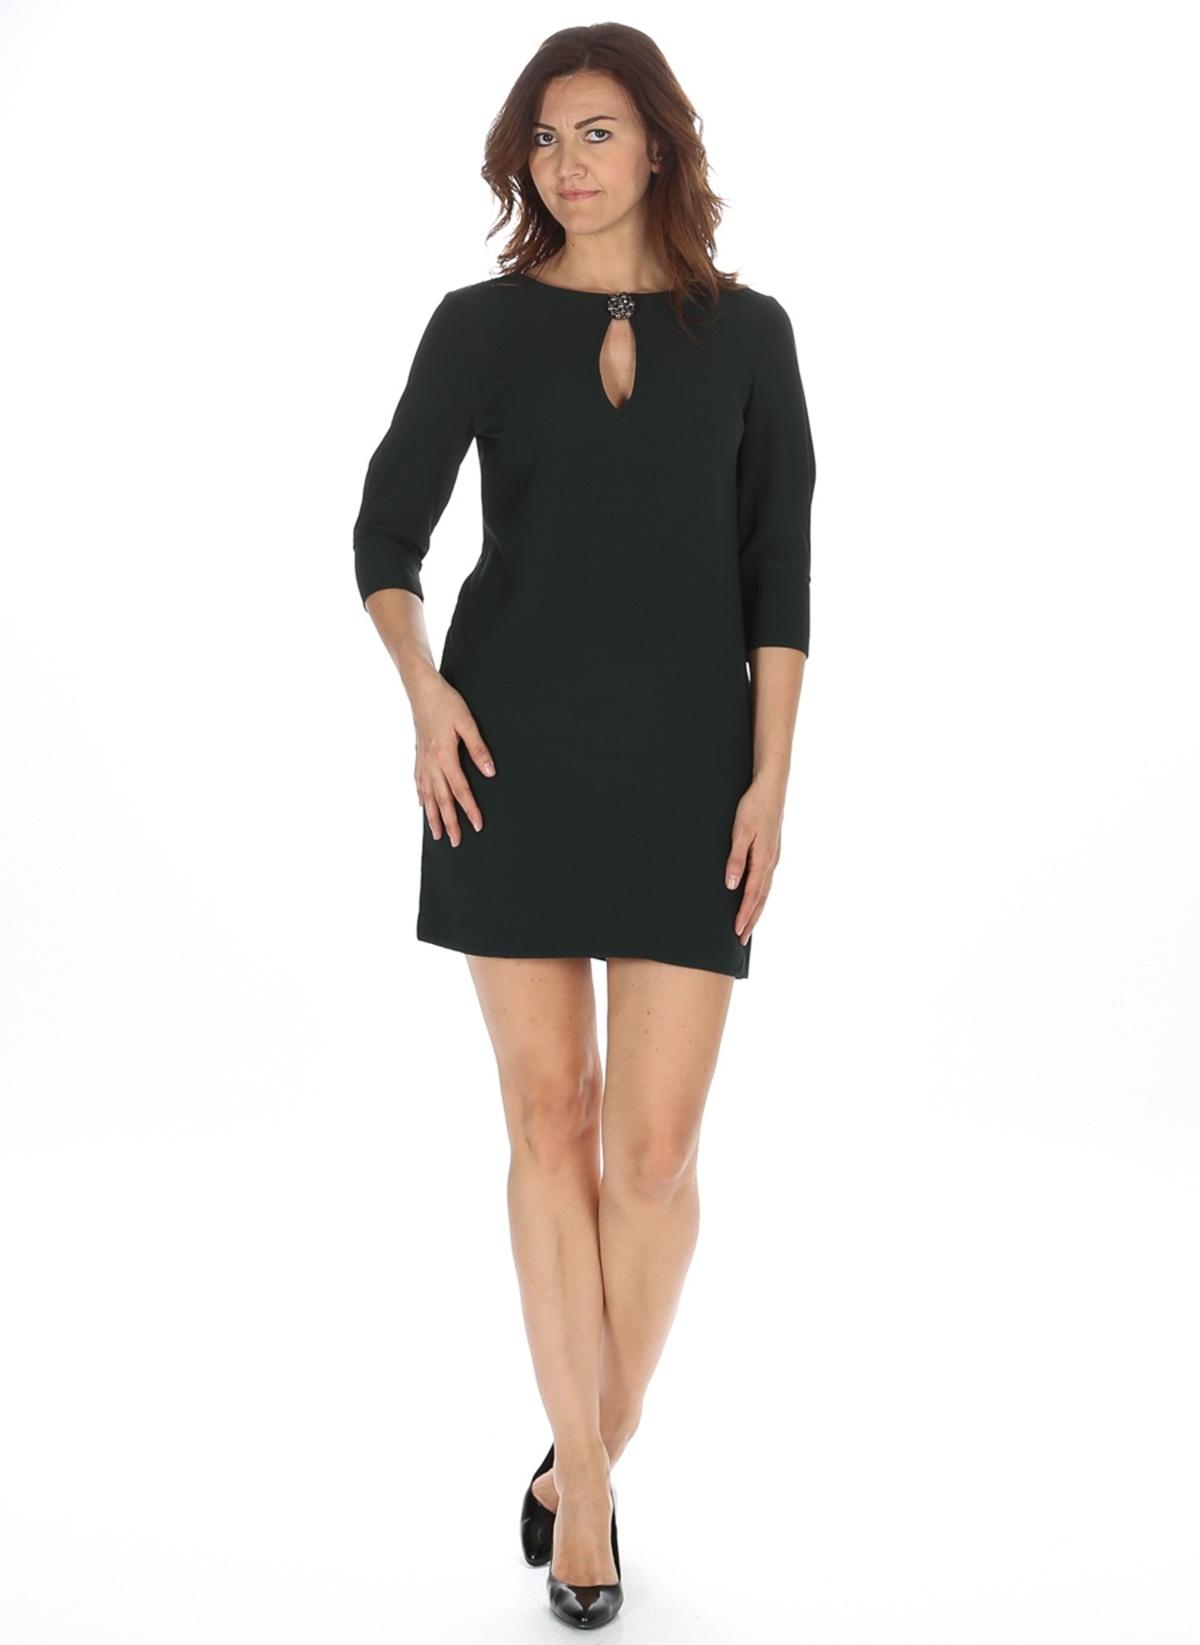 Kadın Sandro Ferrone Elbise